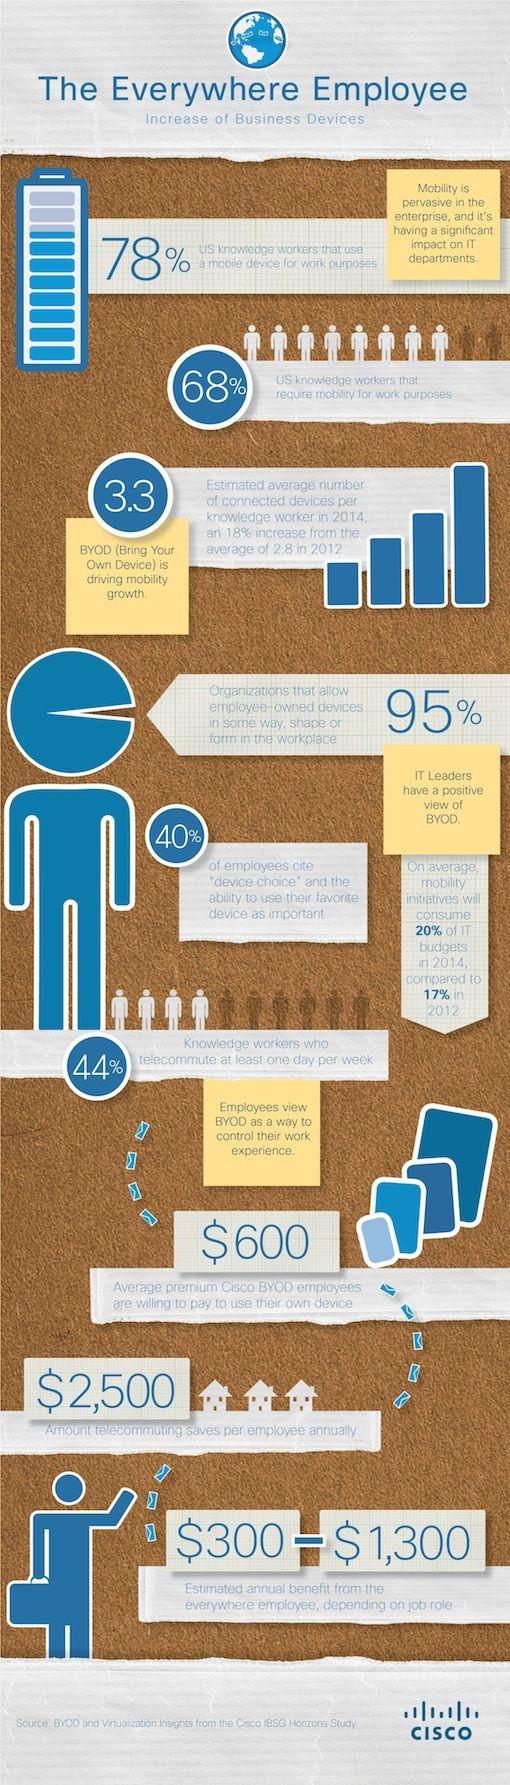 cisco-infographic-small